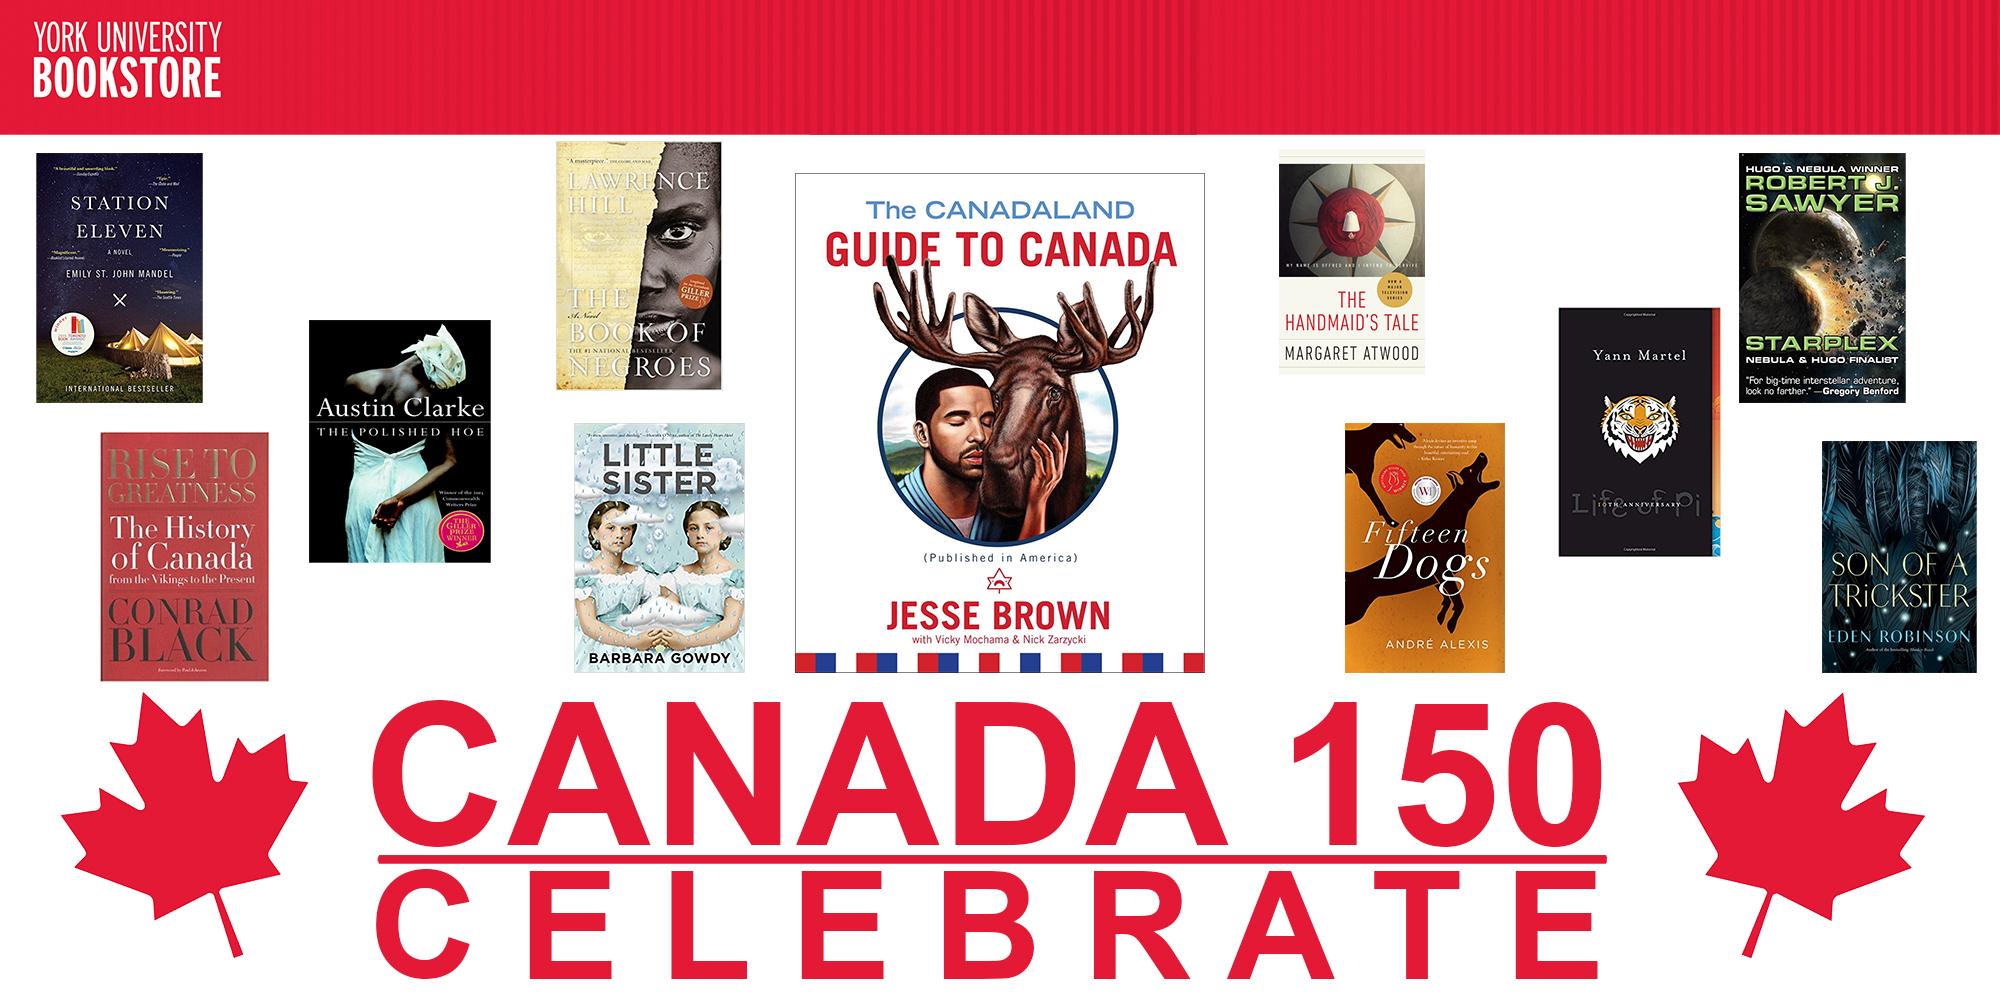 Win Your Books Fall 2017 Canada 150 Years Canada 150 Years